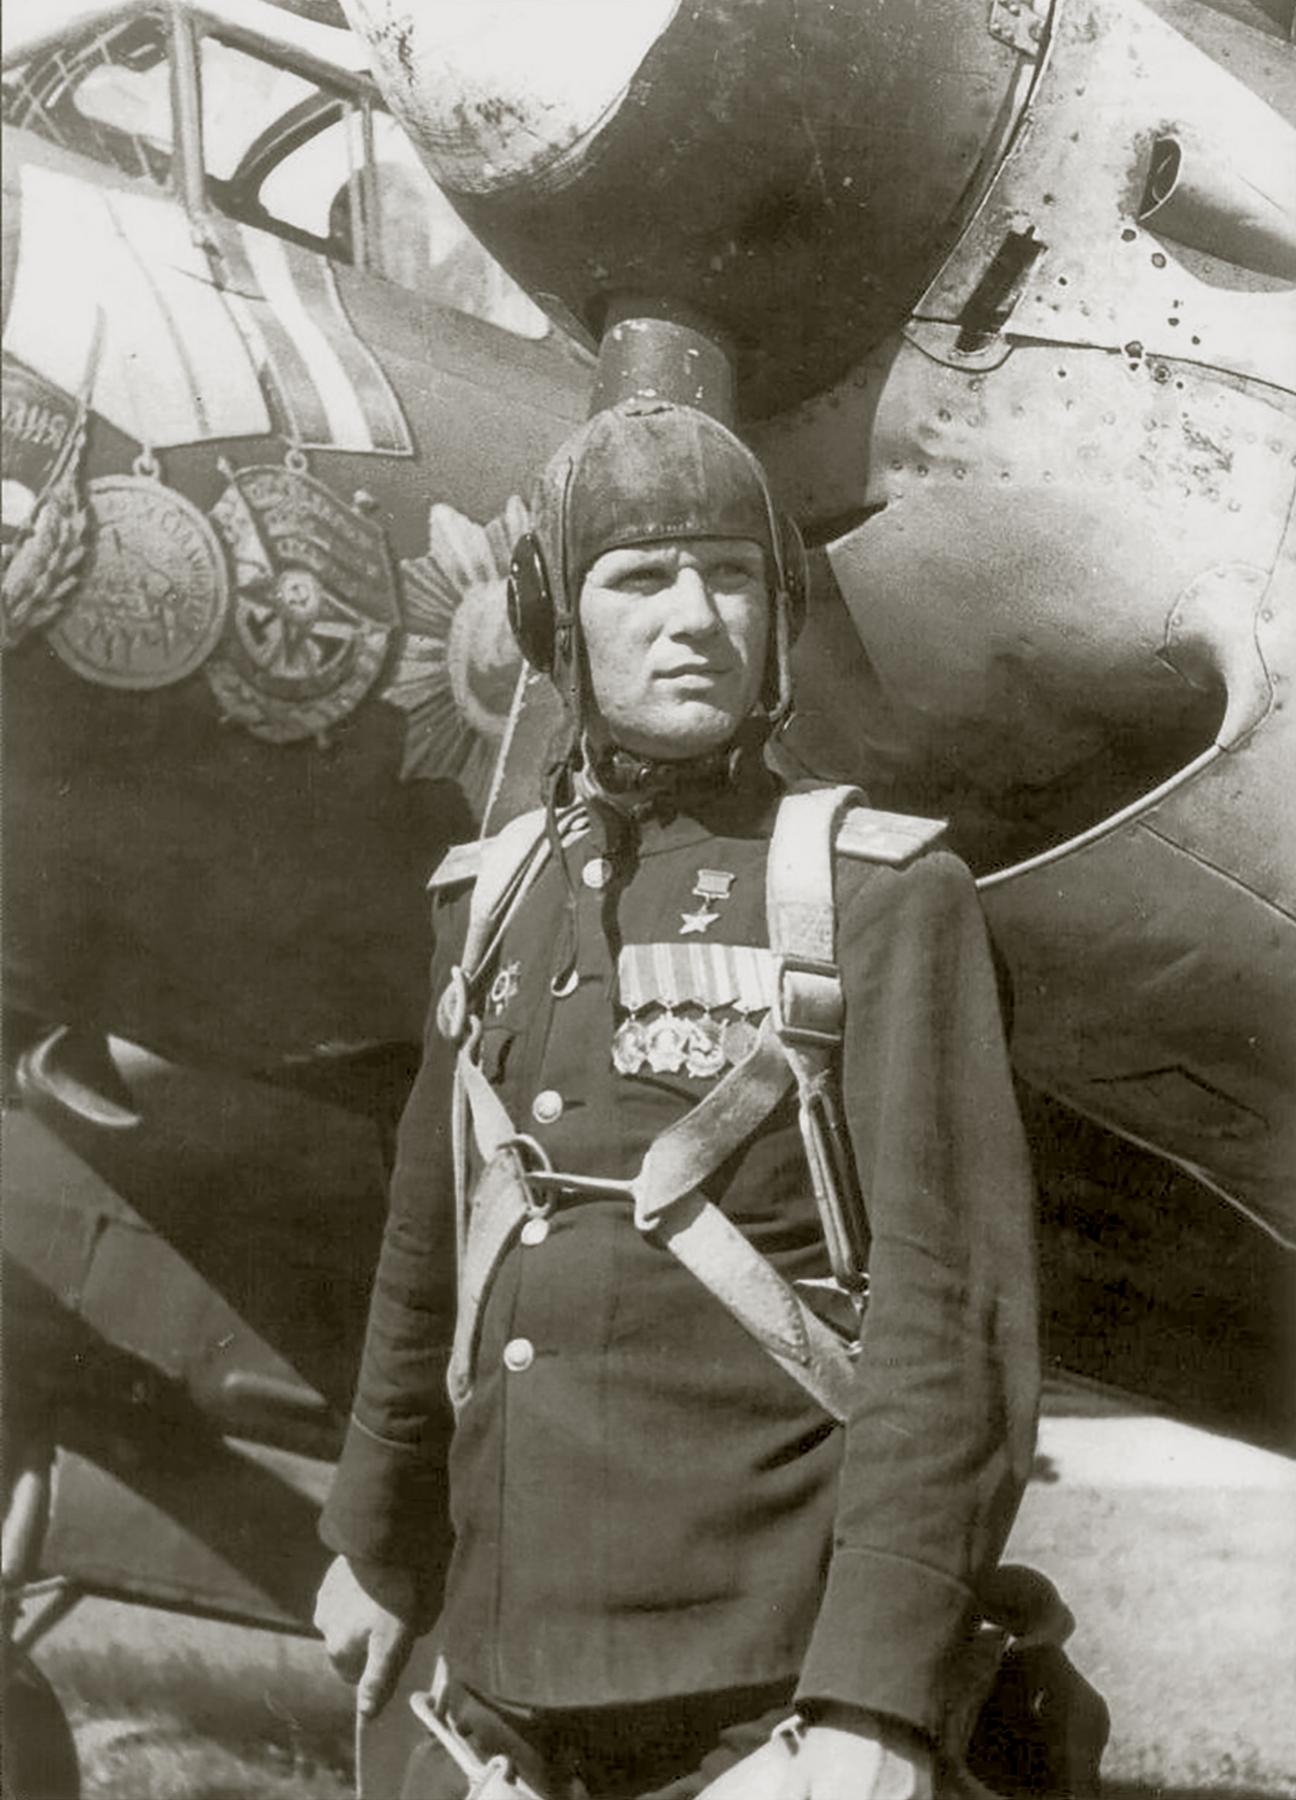 Aircrew Soviet 96GvBAP HSU Hero of the Soviet Union Andrey Petrovich Krupin in 1945 01